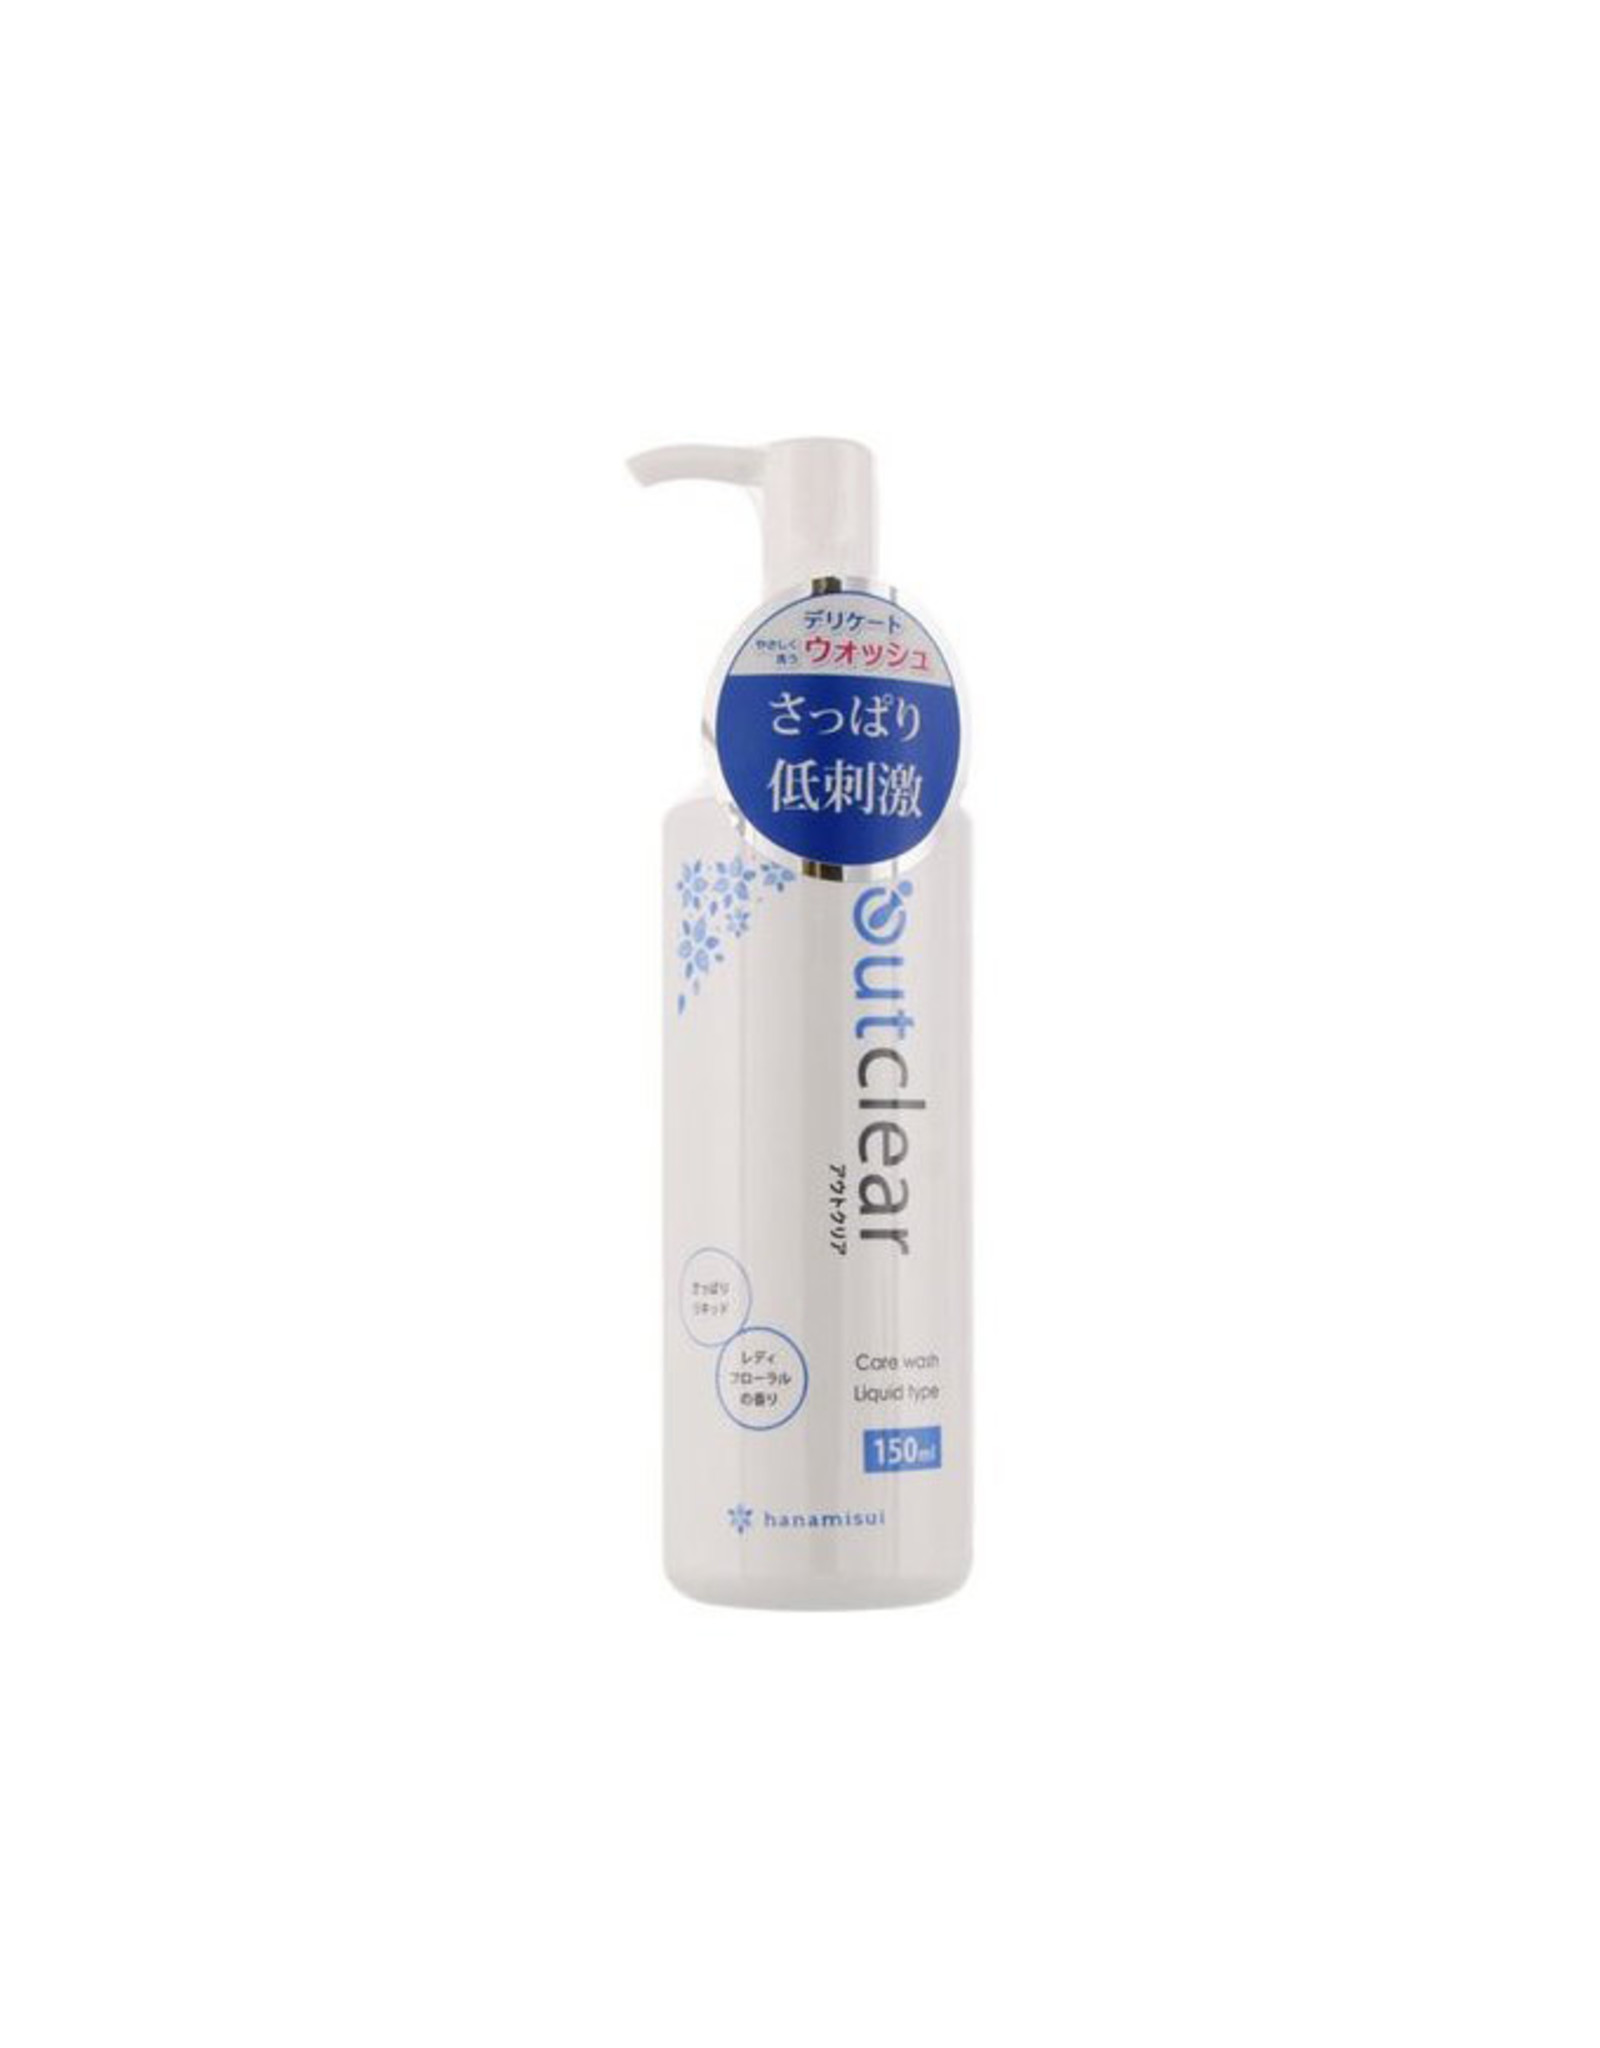 Outclear Feminine Intimate Antibacterial Wash Lotion 150ml